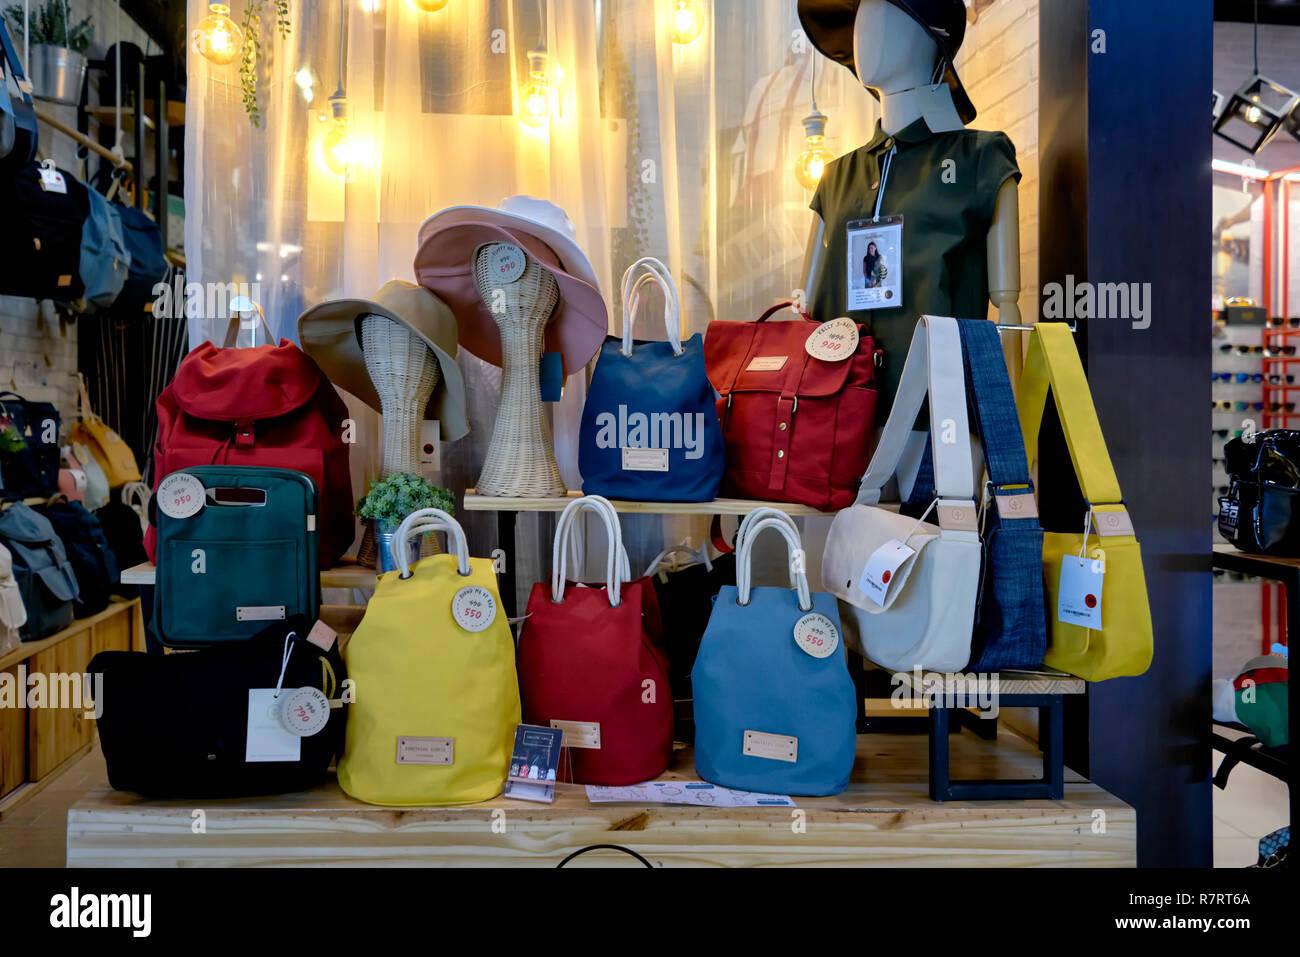 a8e49e8d74 Shop Display Of Handbags Photos & Shop Display Of Handbags Images ...